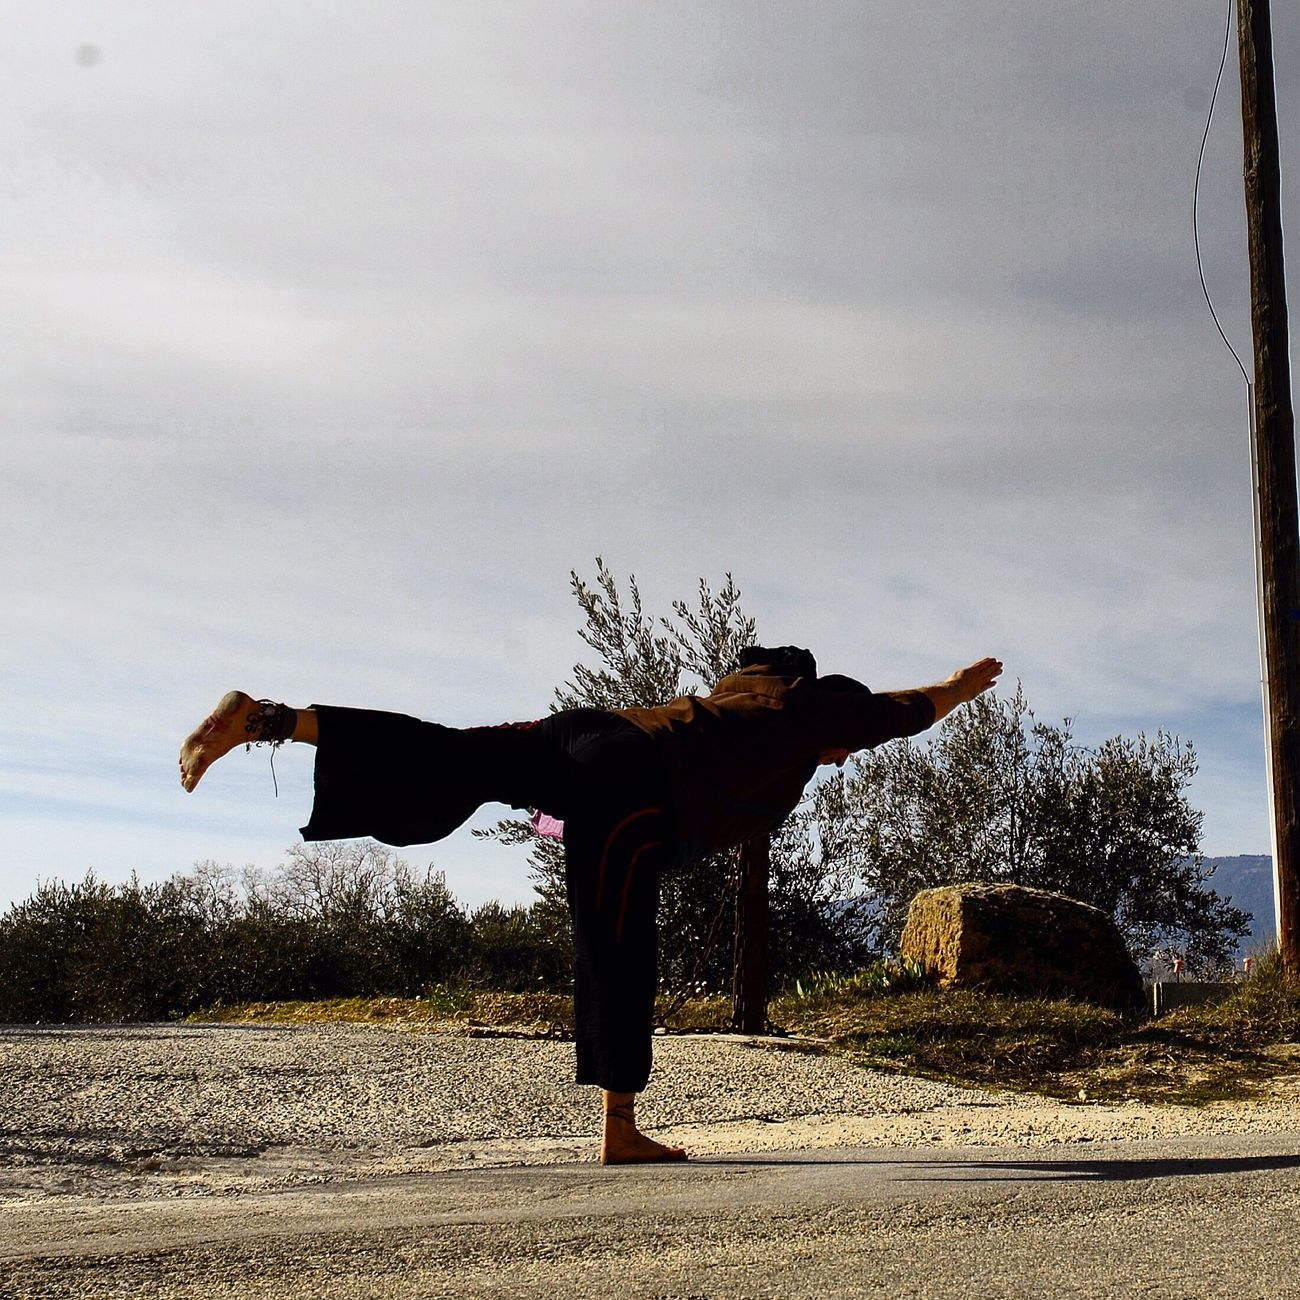 Namaste Yoga Freedom Relaxing Barefoot Lifestyle Inner Peace OM Just Live Barefoot Virabhadrasana III